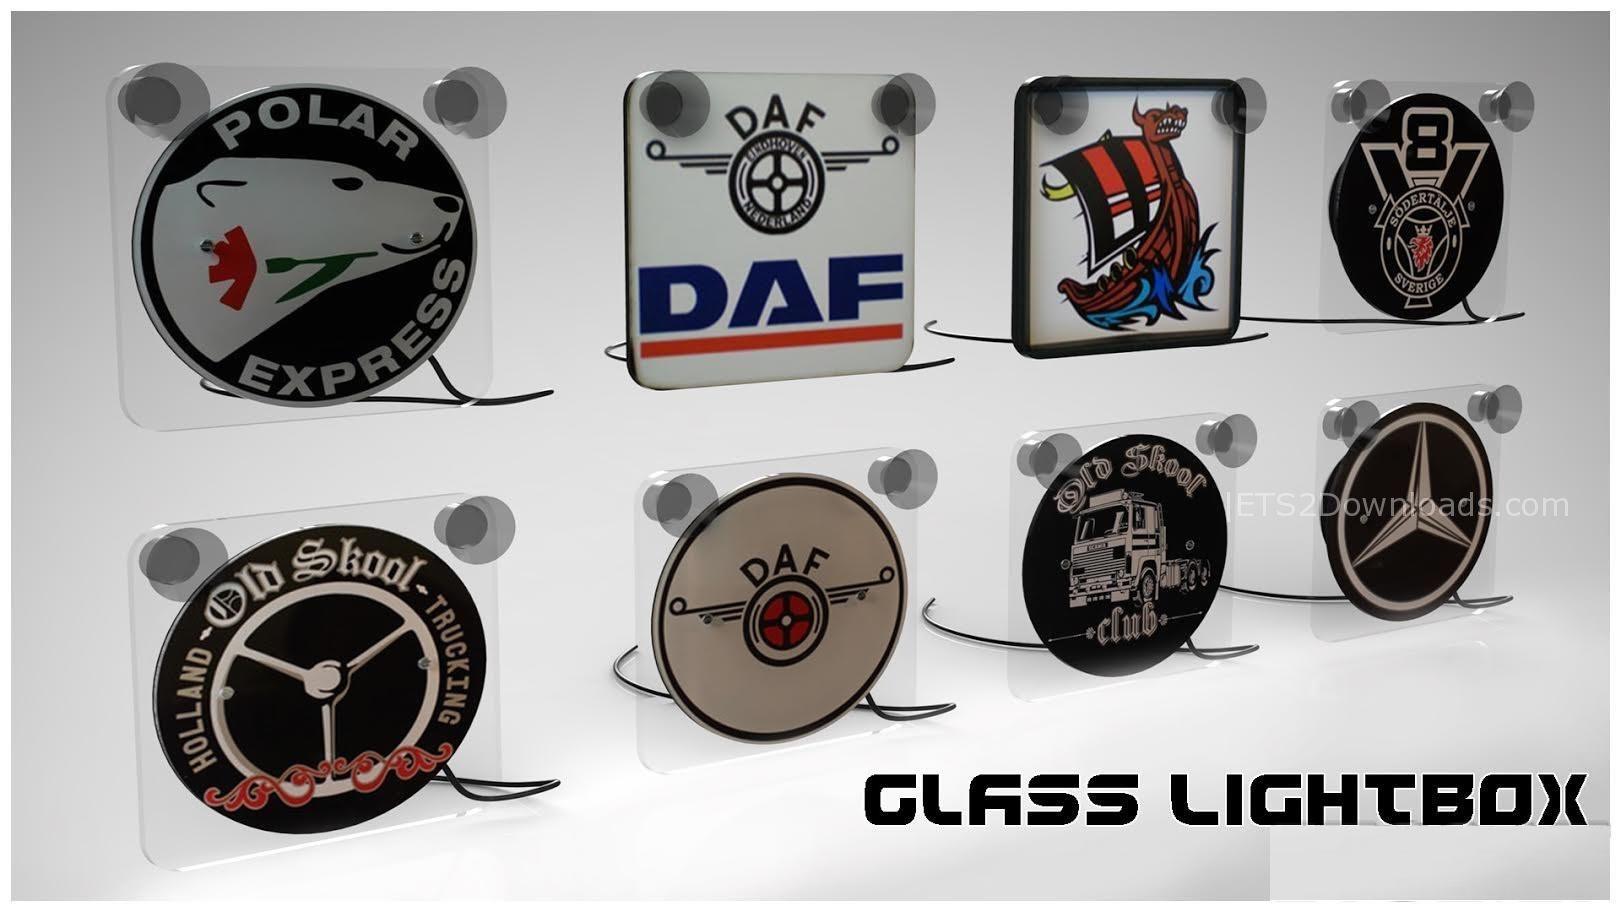 glass-lightbox-1